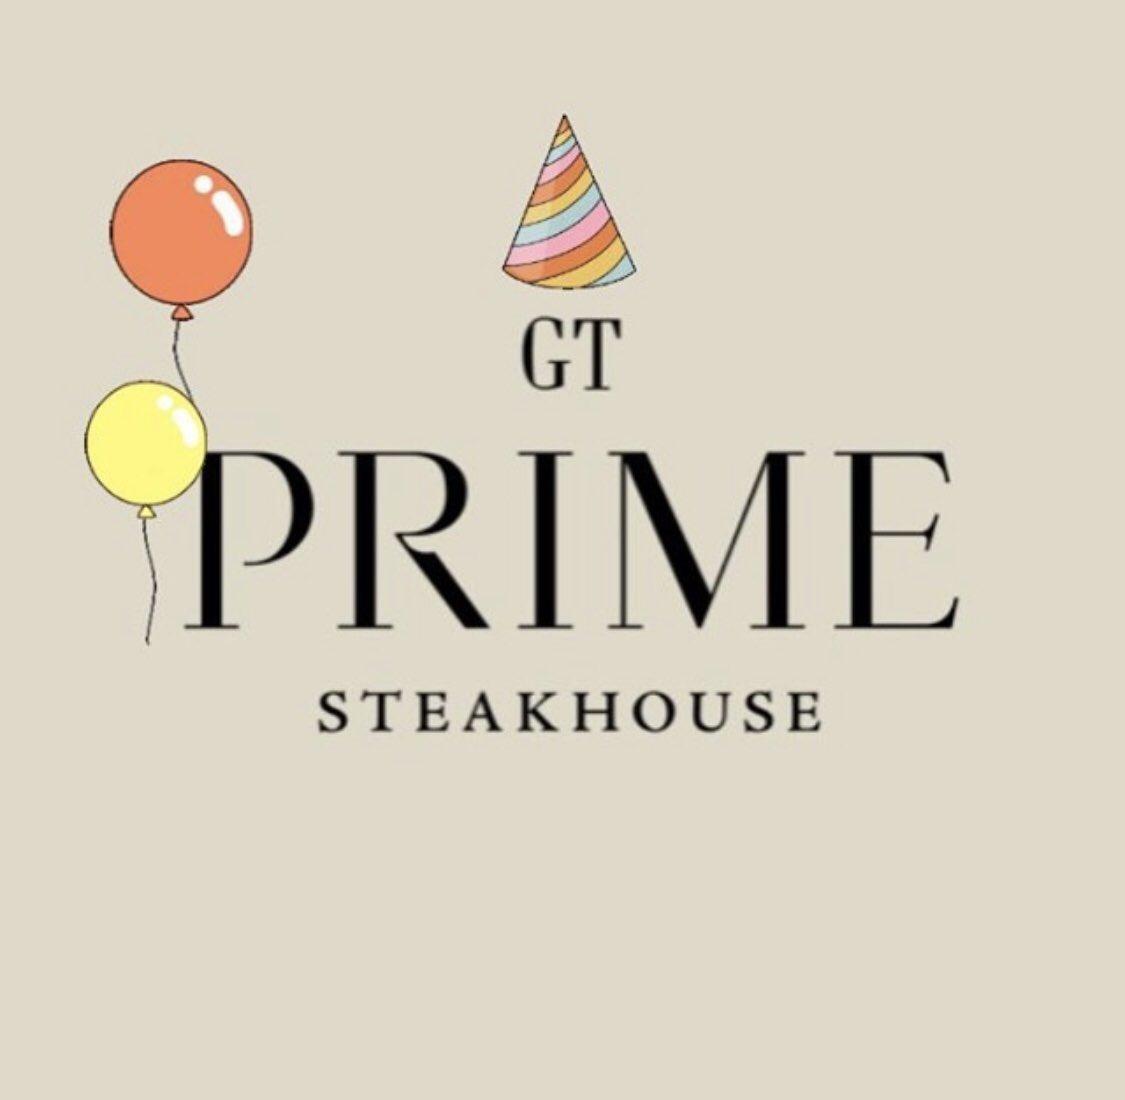 Happy 4th Birthday @GTprimechicago 🙏🙏♥️